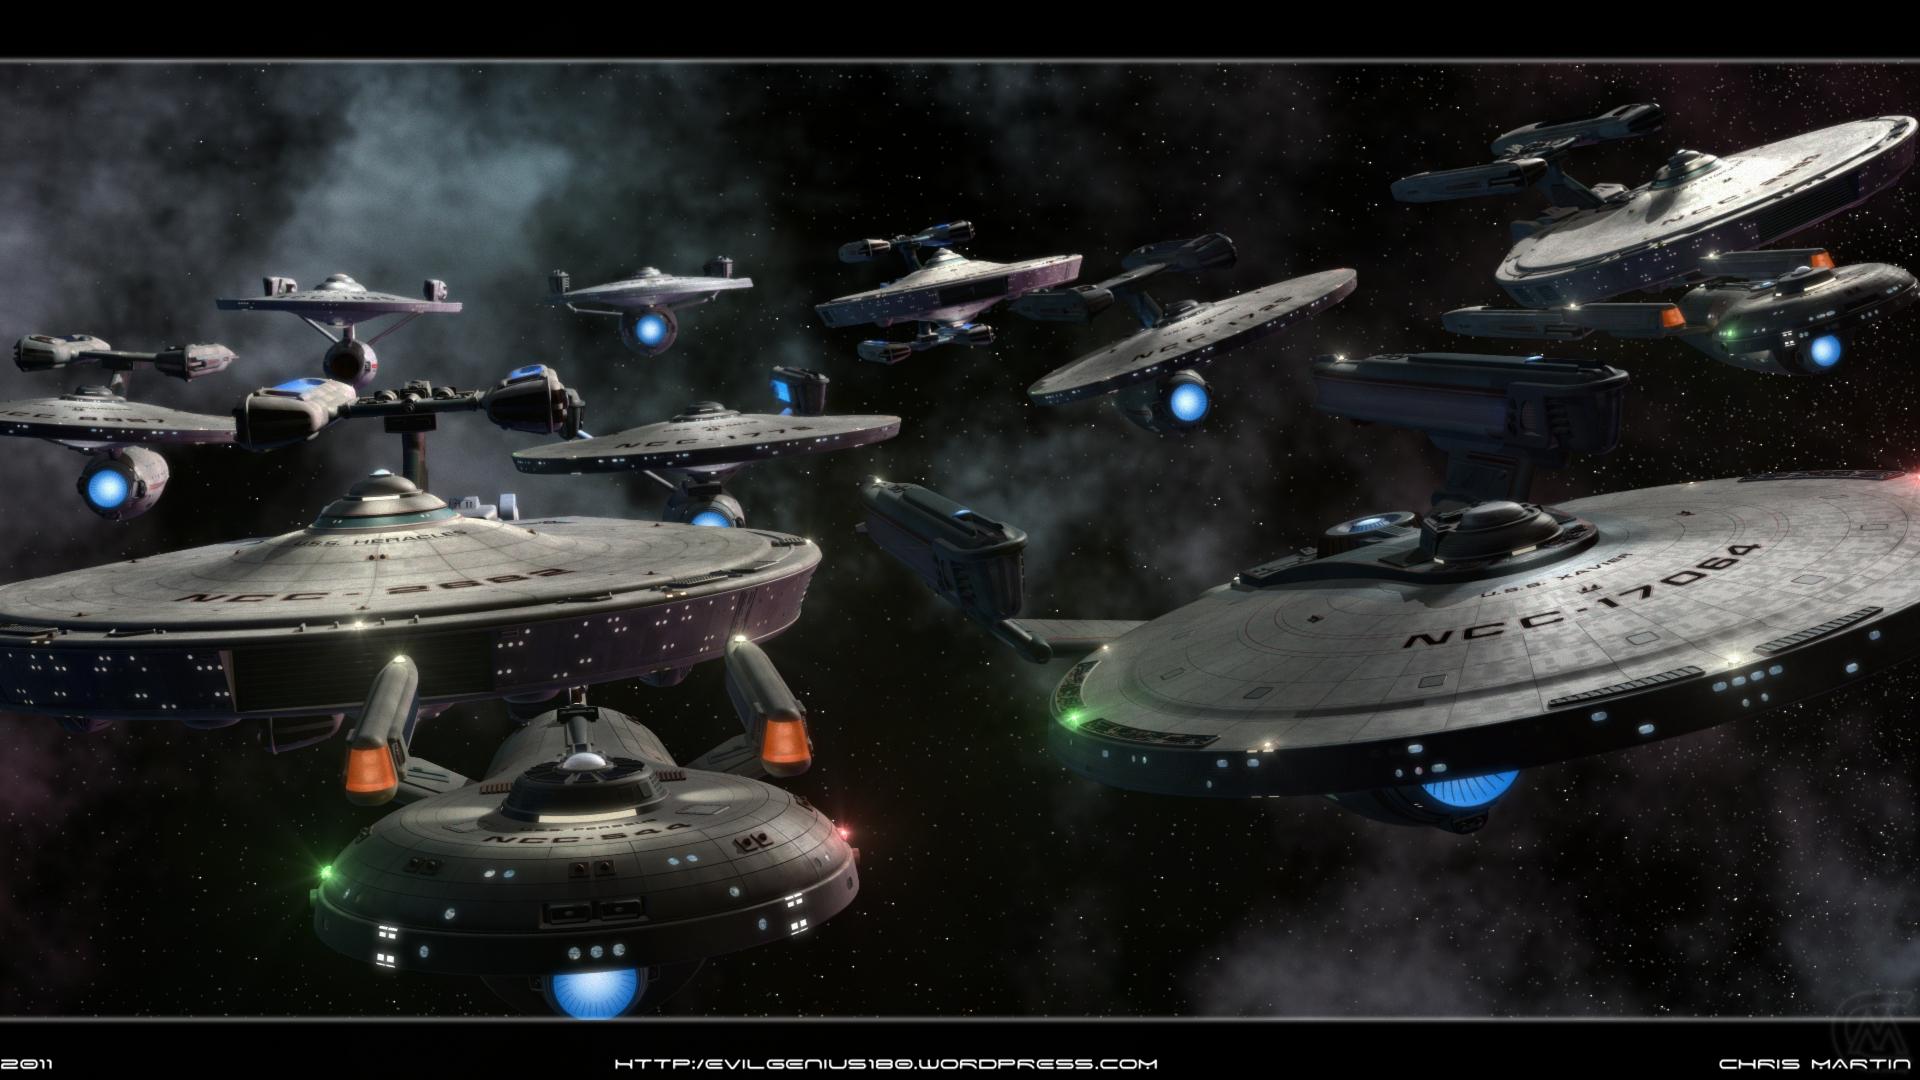 July 2011 Evil Starship Factory 1920x1080